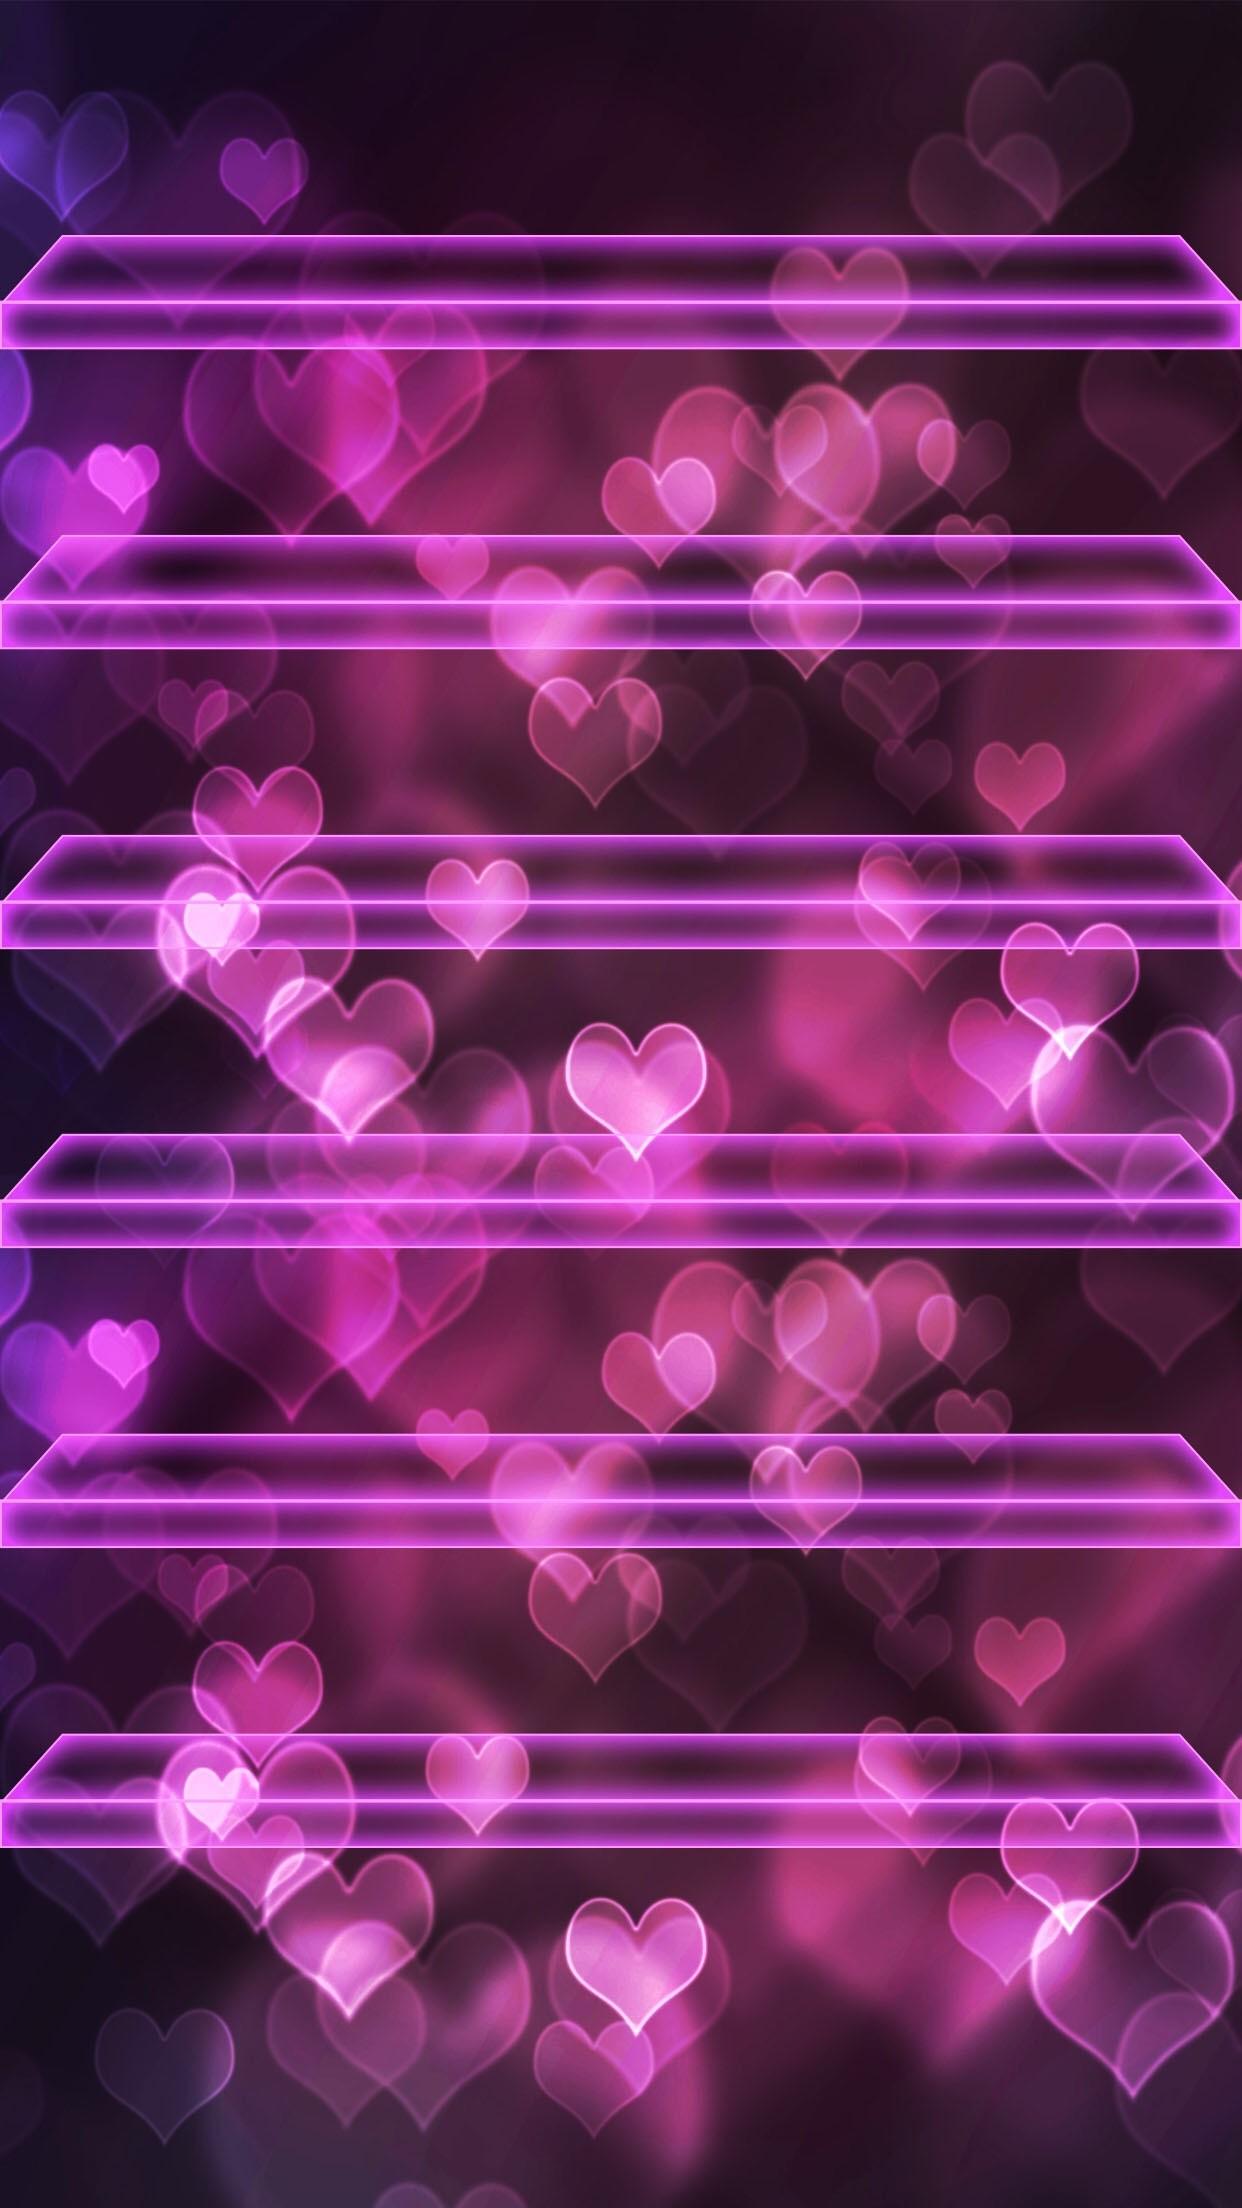 A A Tap And Get The Free App Shelves Hearts Bokeh Girly Wallpaper Ipad Mini 1242x2208 Wallpaper Teahub Io